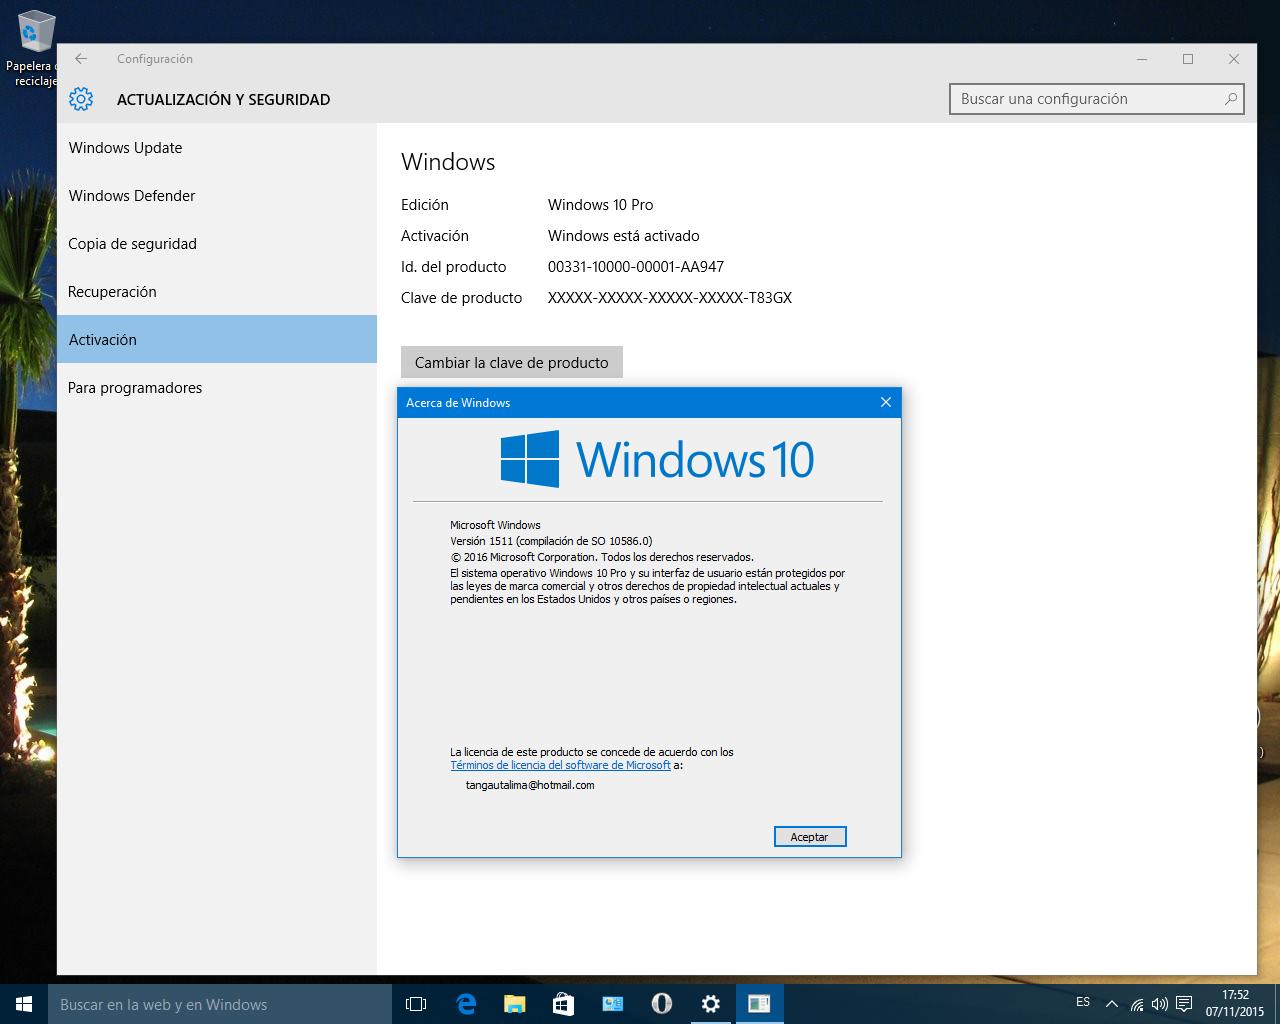 Windows 10 Pro Final Original Microsoft Vlsc: Windows 10 Build 10586 Iso Final X32/64 Bits